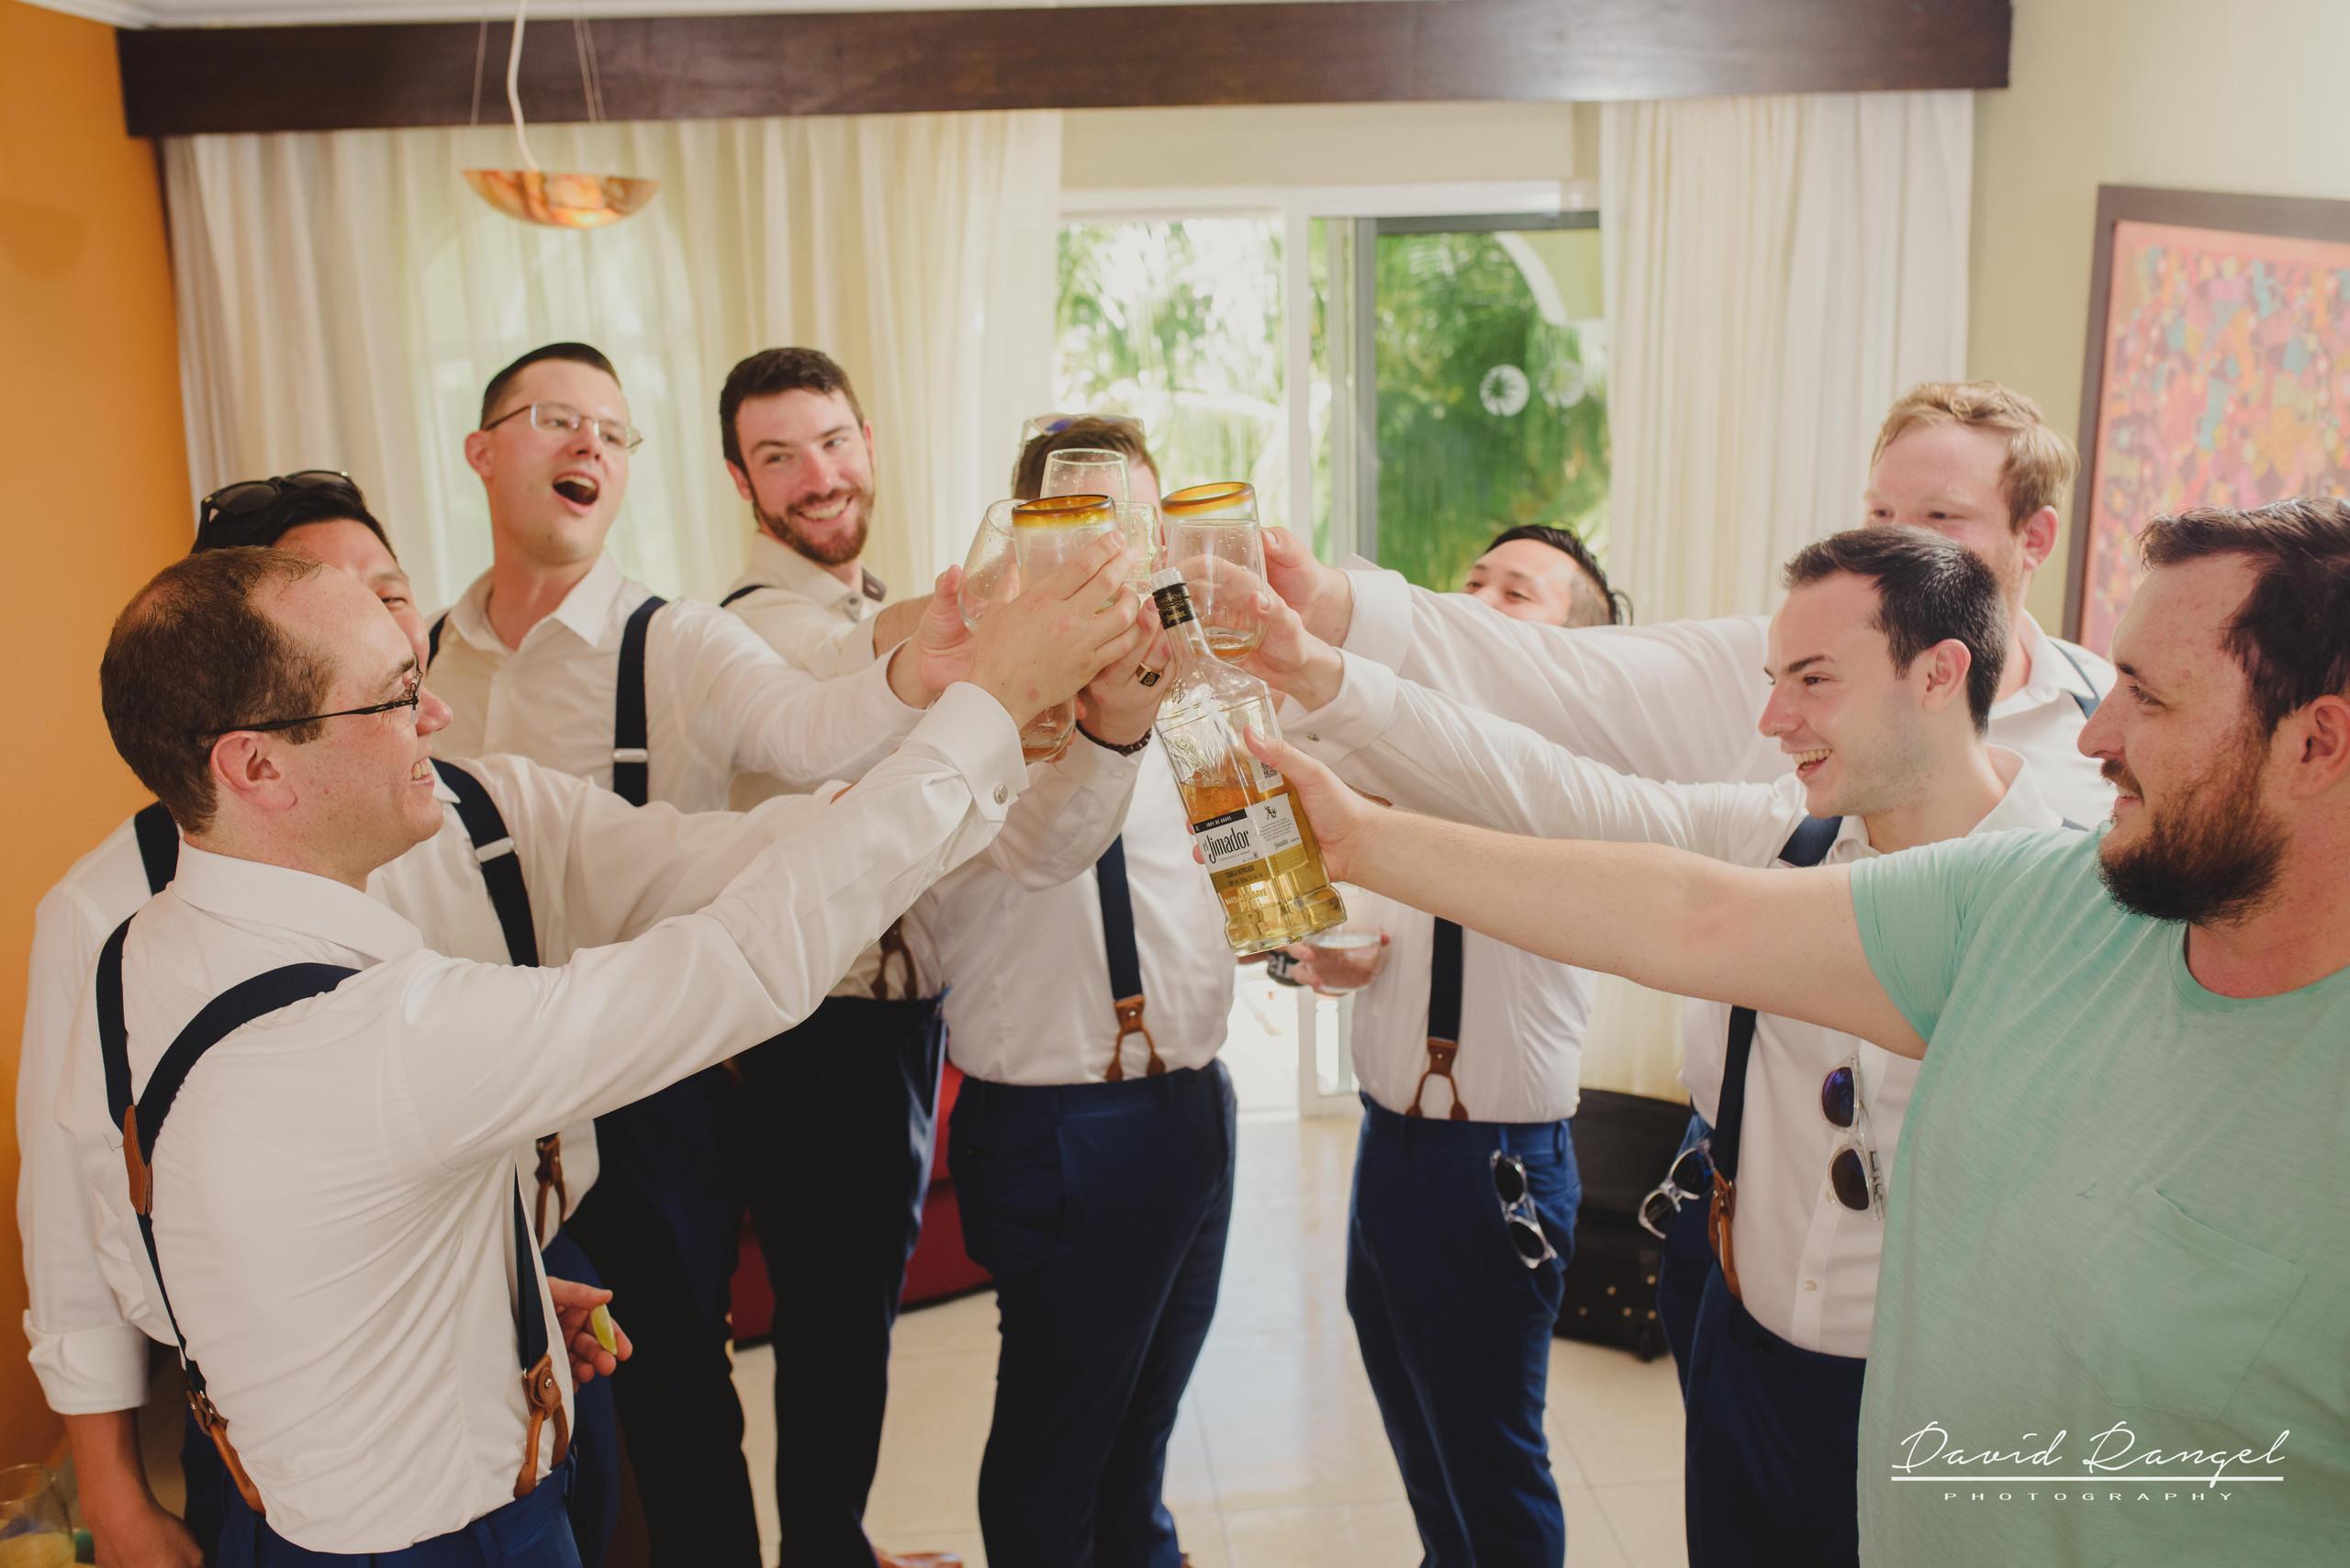 groom+groomsmens+getting+ready+room+photo+suit+crew+celebration